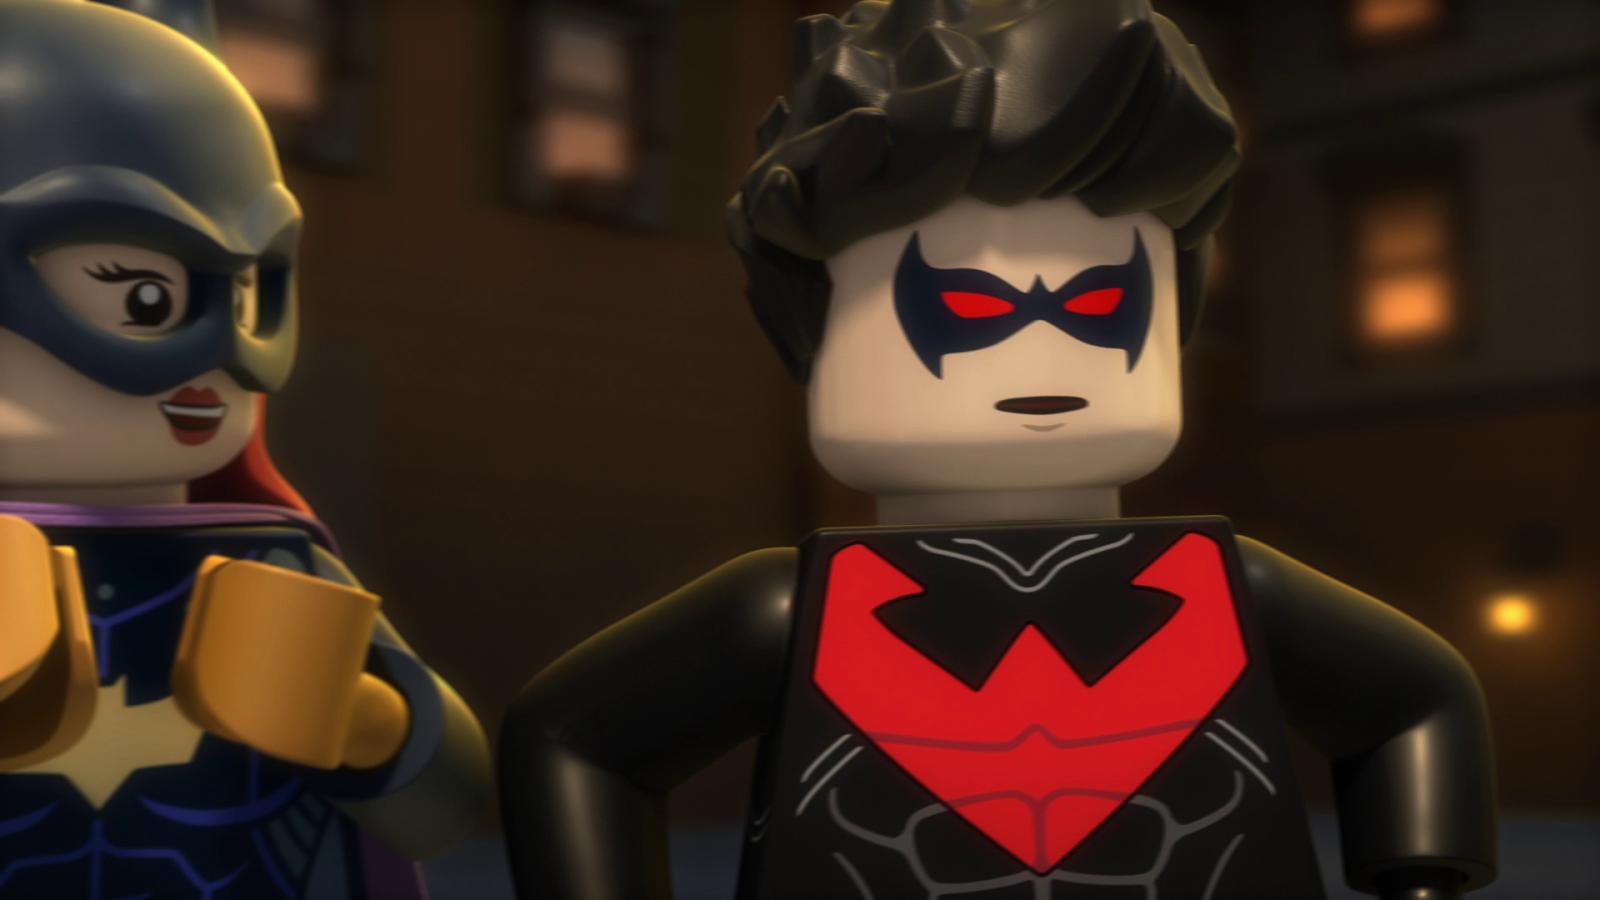 Lego DC Comics Superheroes Justice League - Gotham City Breakout (2016) 1080p BD25 1